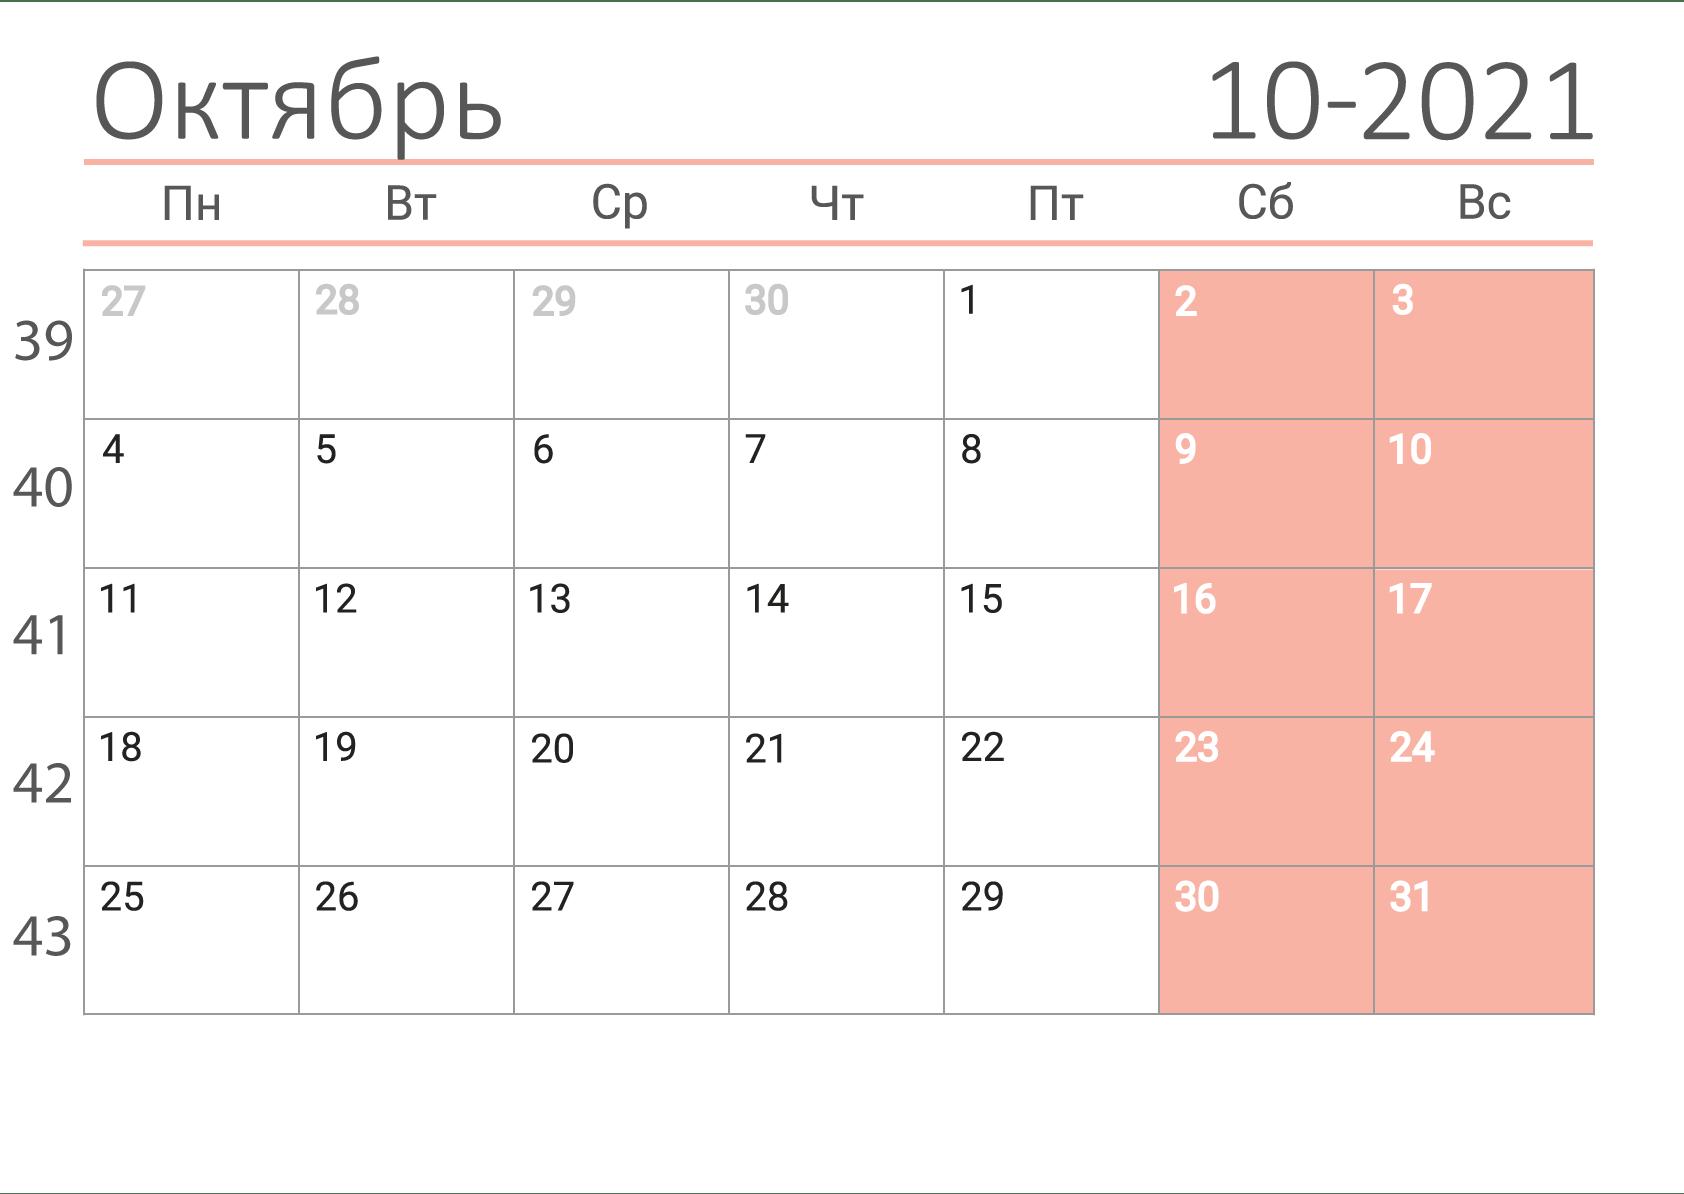 Октябрь 2021 - Календарь-сетка